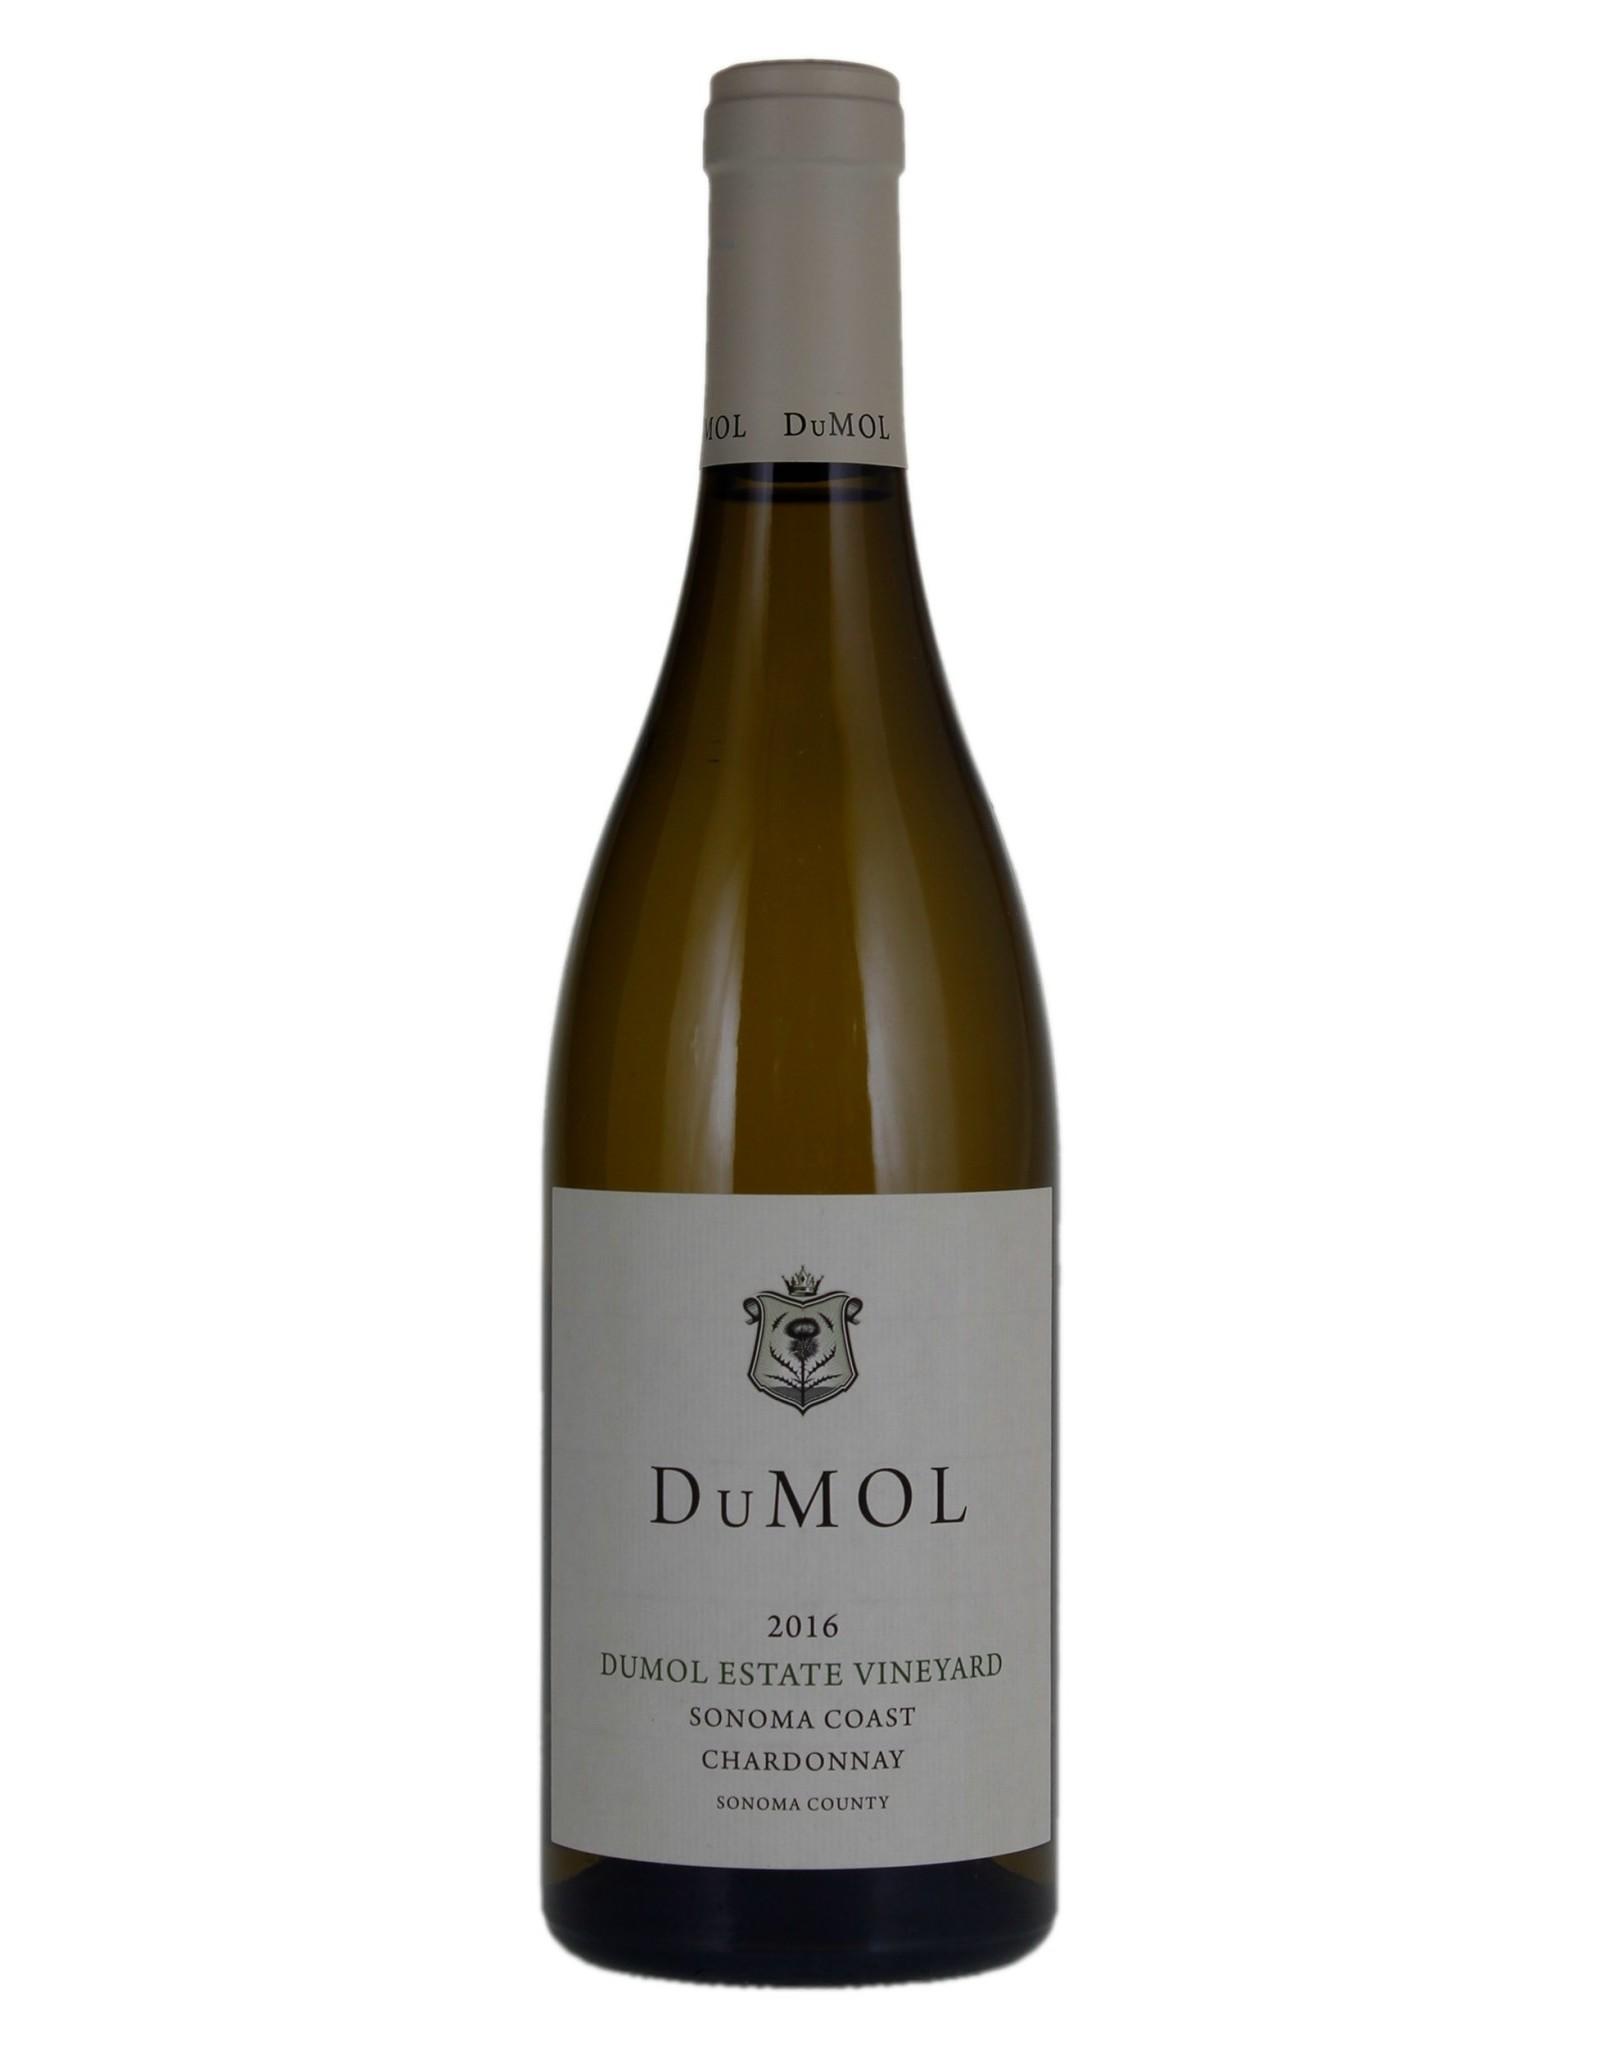 DuMOL Estate Vineyard Sonoma Coast Chardonnay 2016